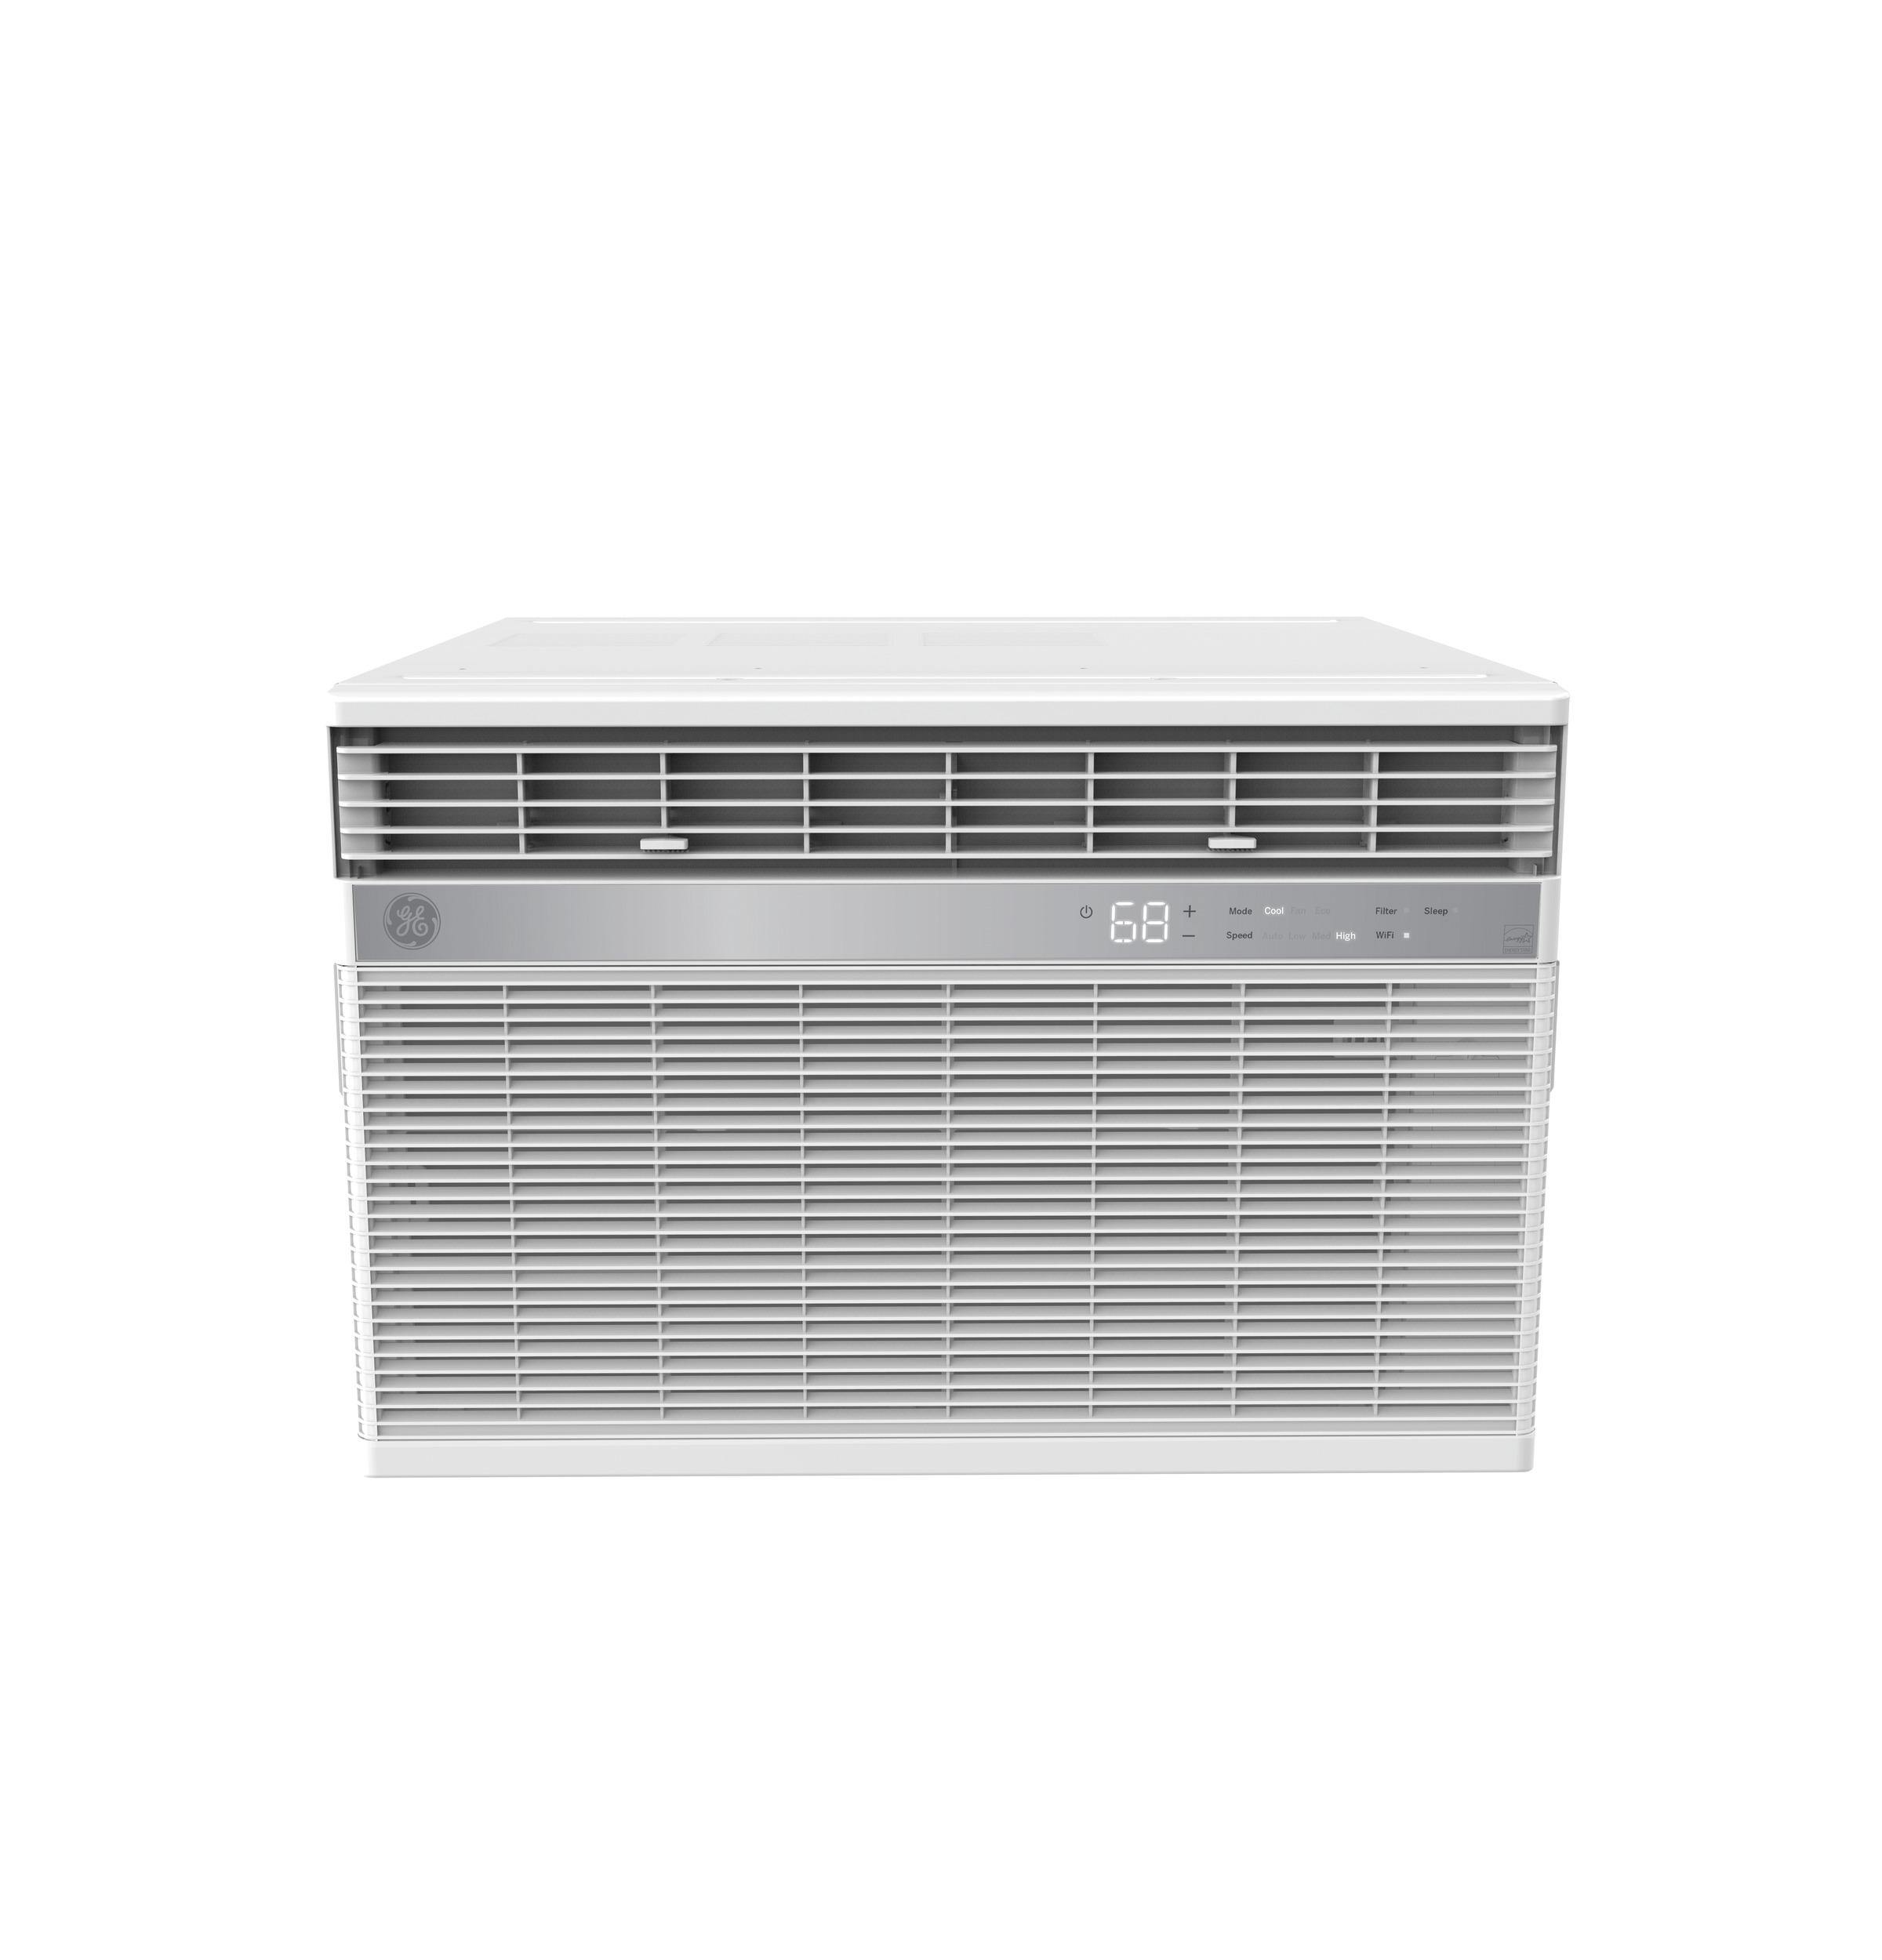 GE GE® ENERGY STAR® 23,500/22,900 BTU 230/208 Volt Smart Electronic Window Air Conditioner